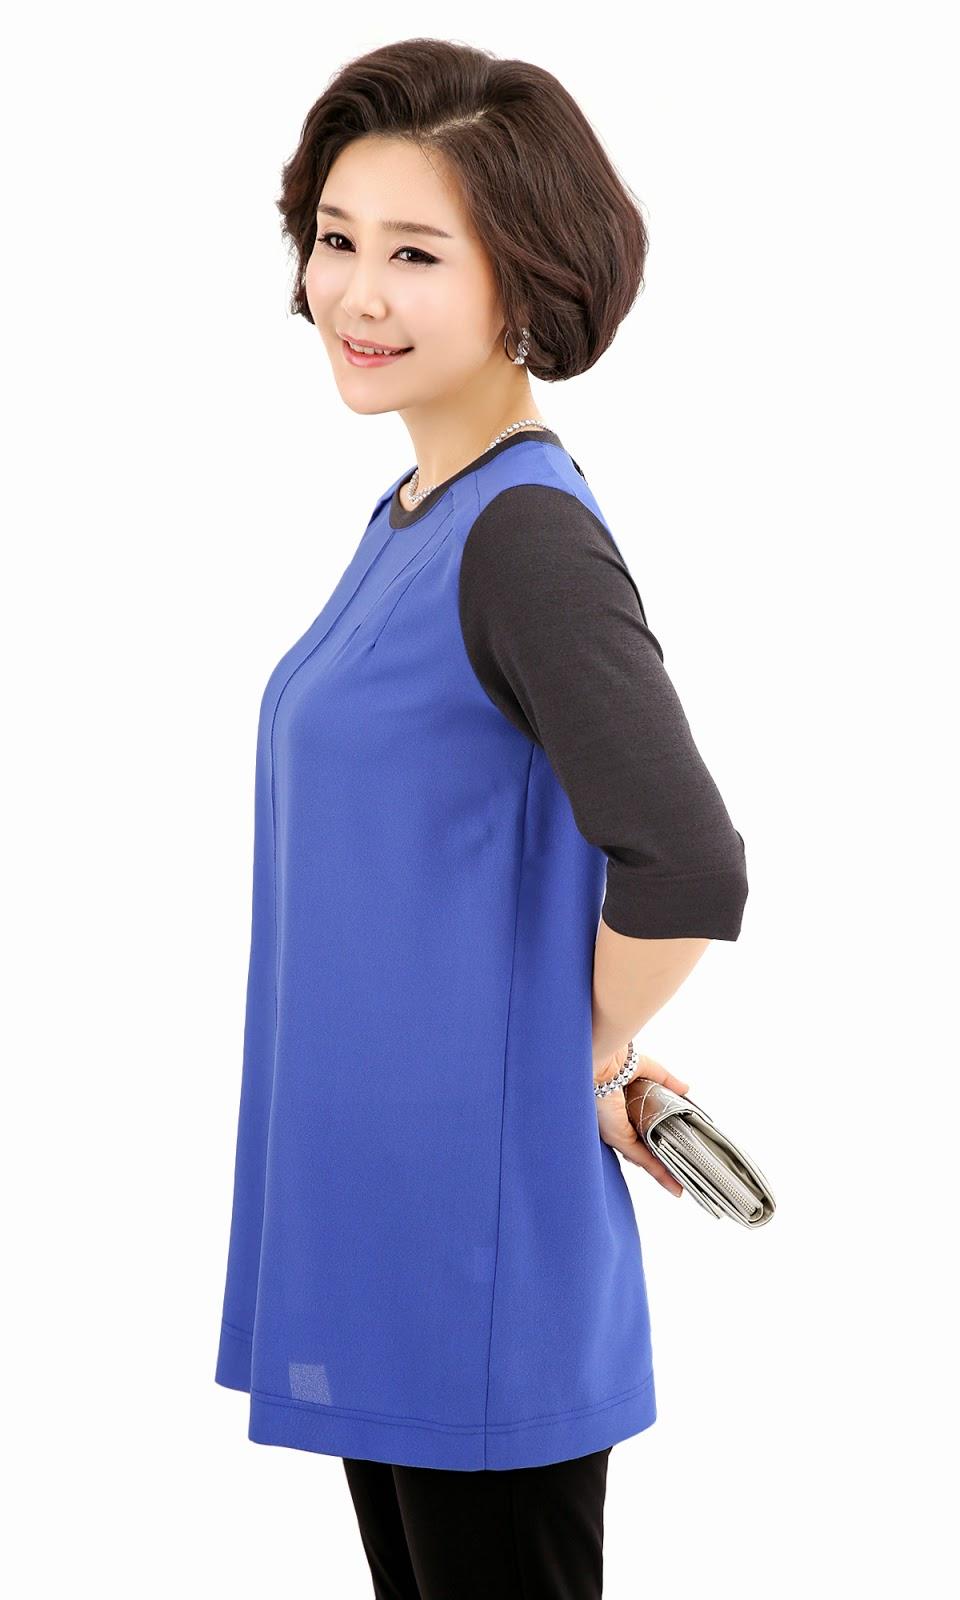 Middle-Agedolder Womens Fashion Clothing Apparel-4648